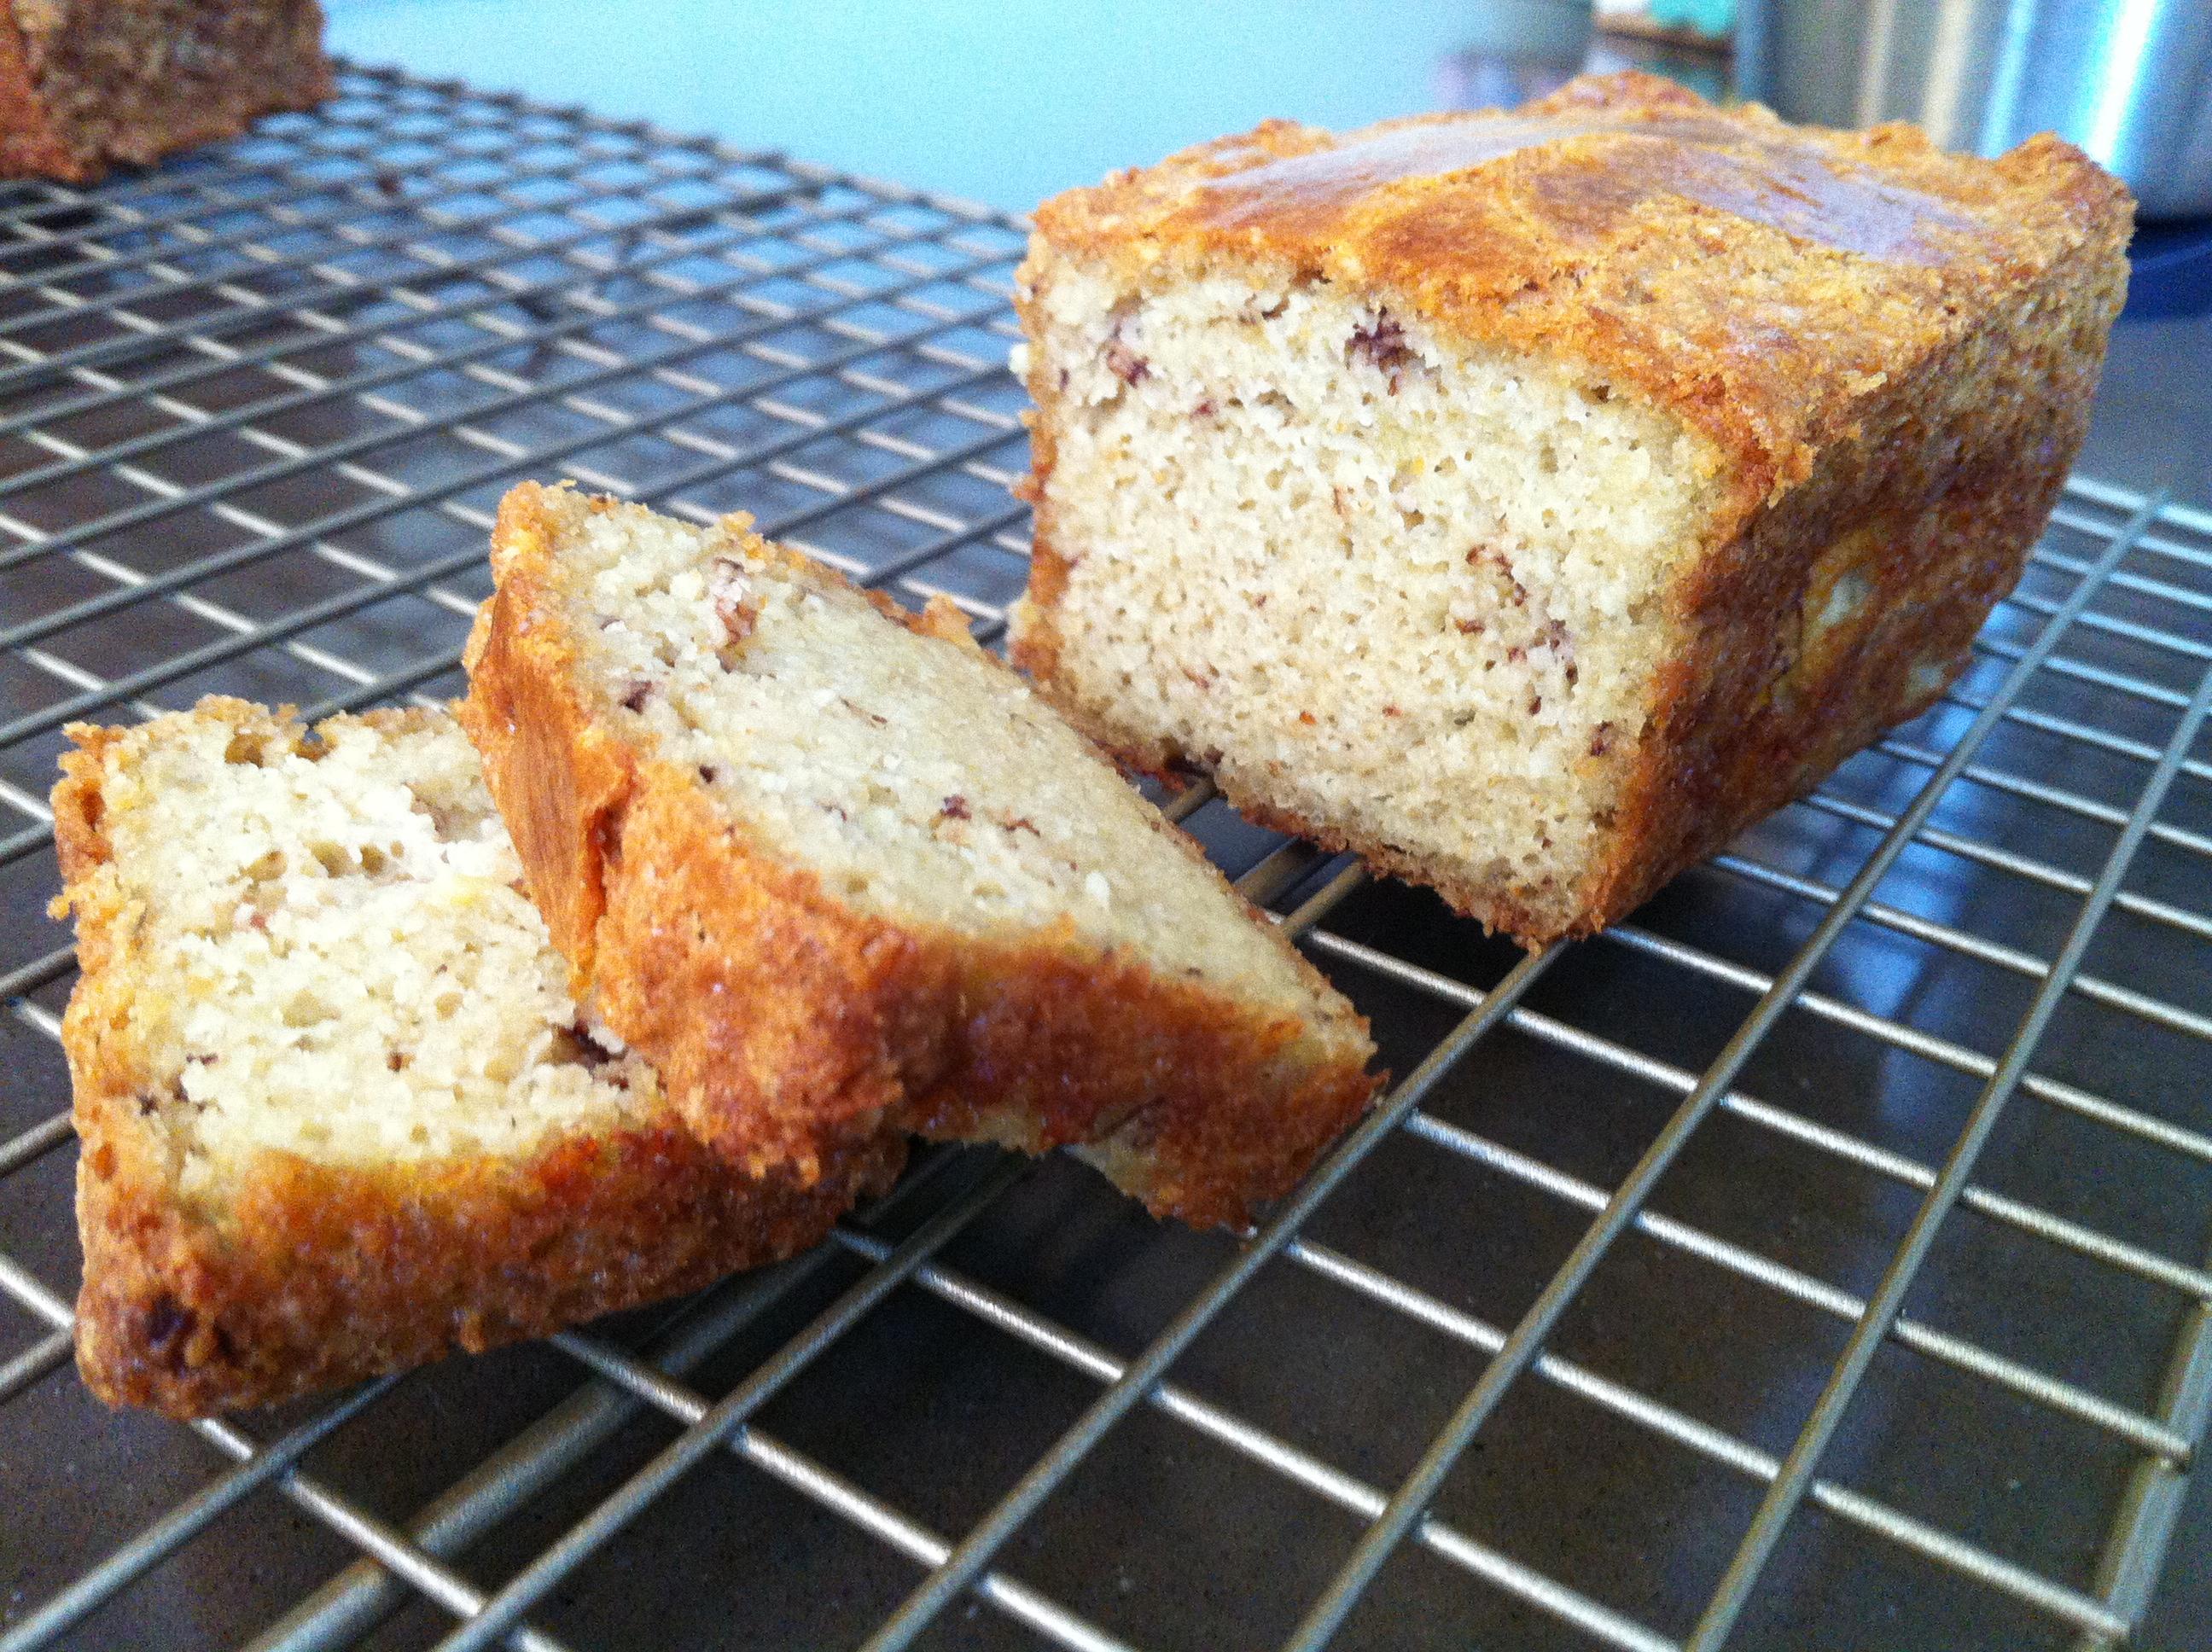 Bread for keto diet